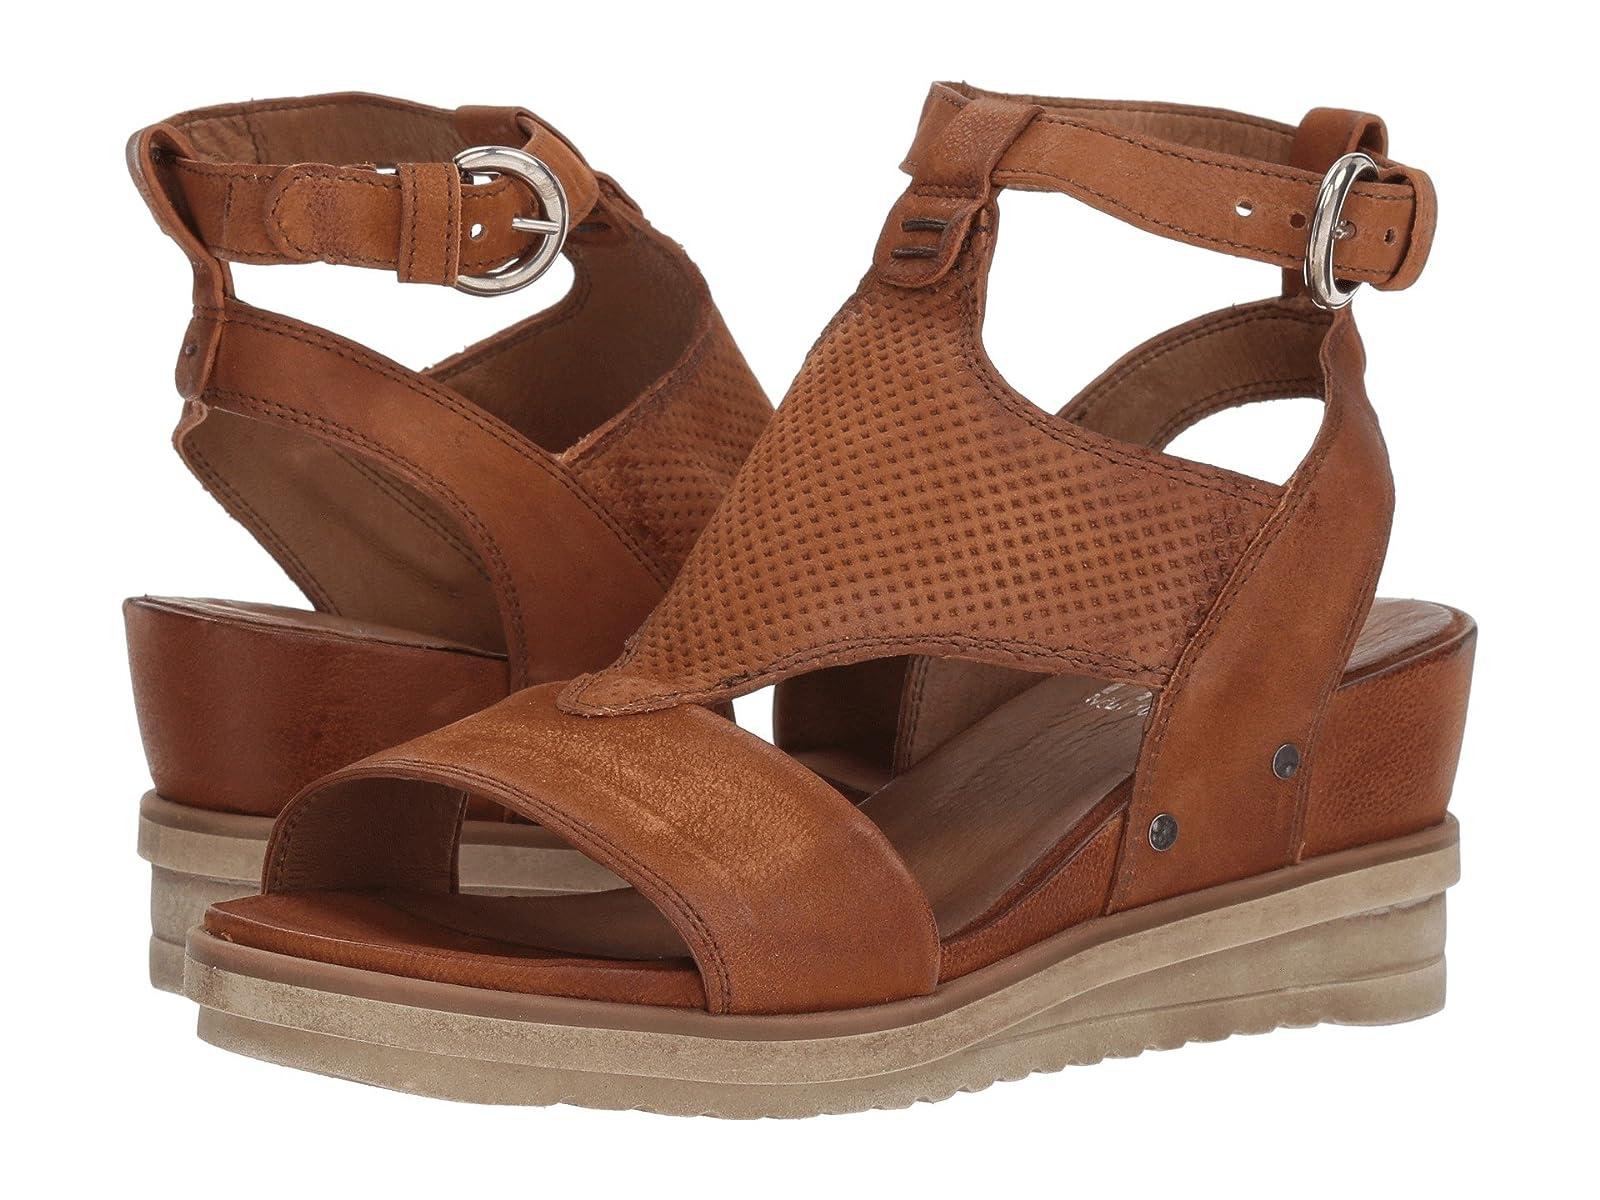 Miz Mooz MauraAtmospheric grades have affordable shoes